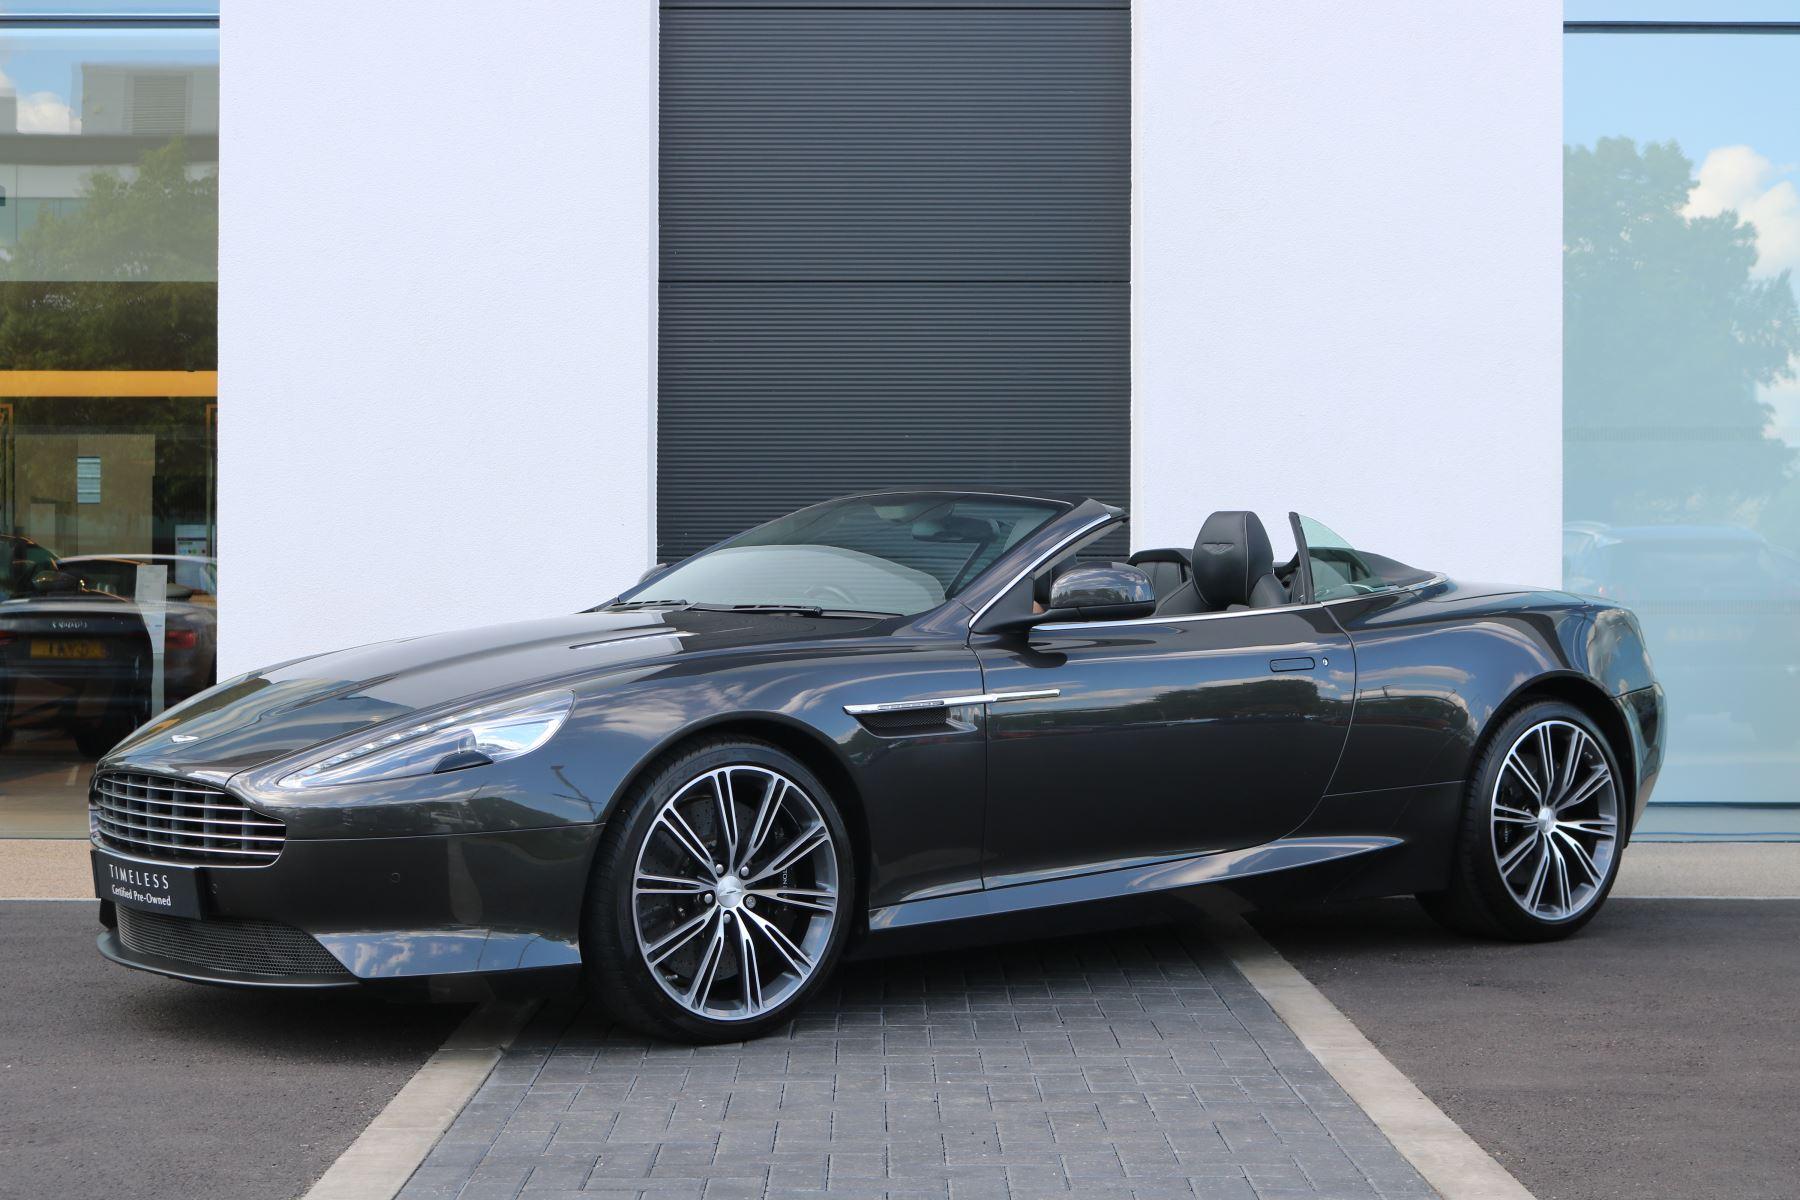 Aston Martin Virage V12 2dr Volante Touchtronic image 2